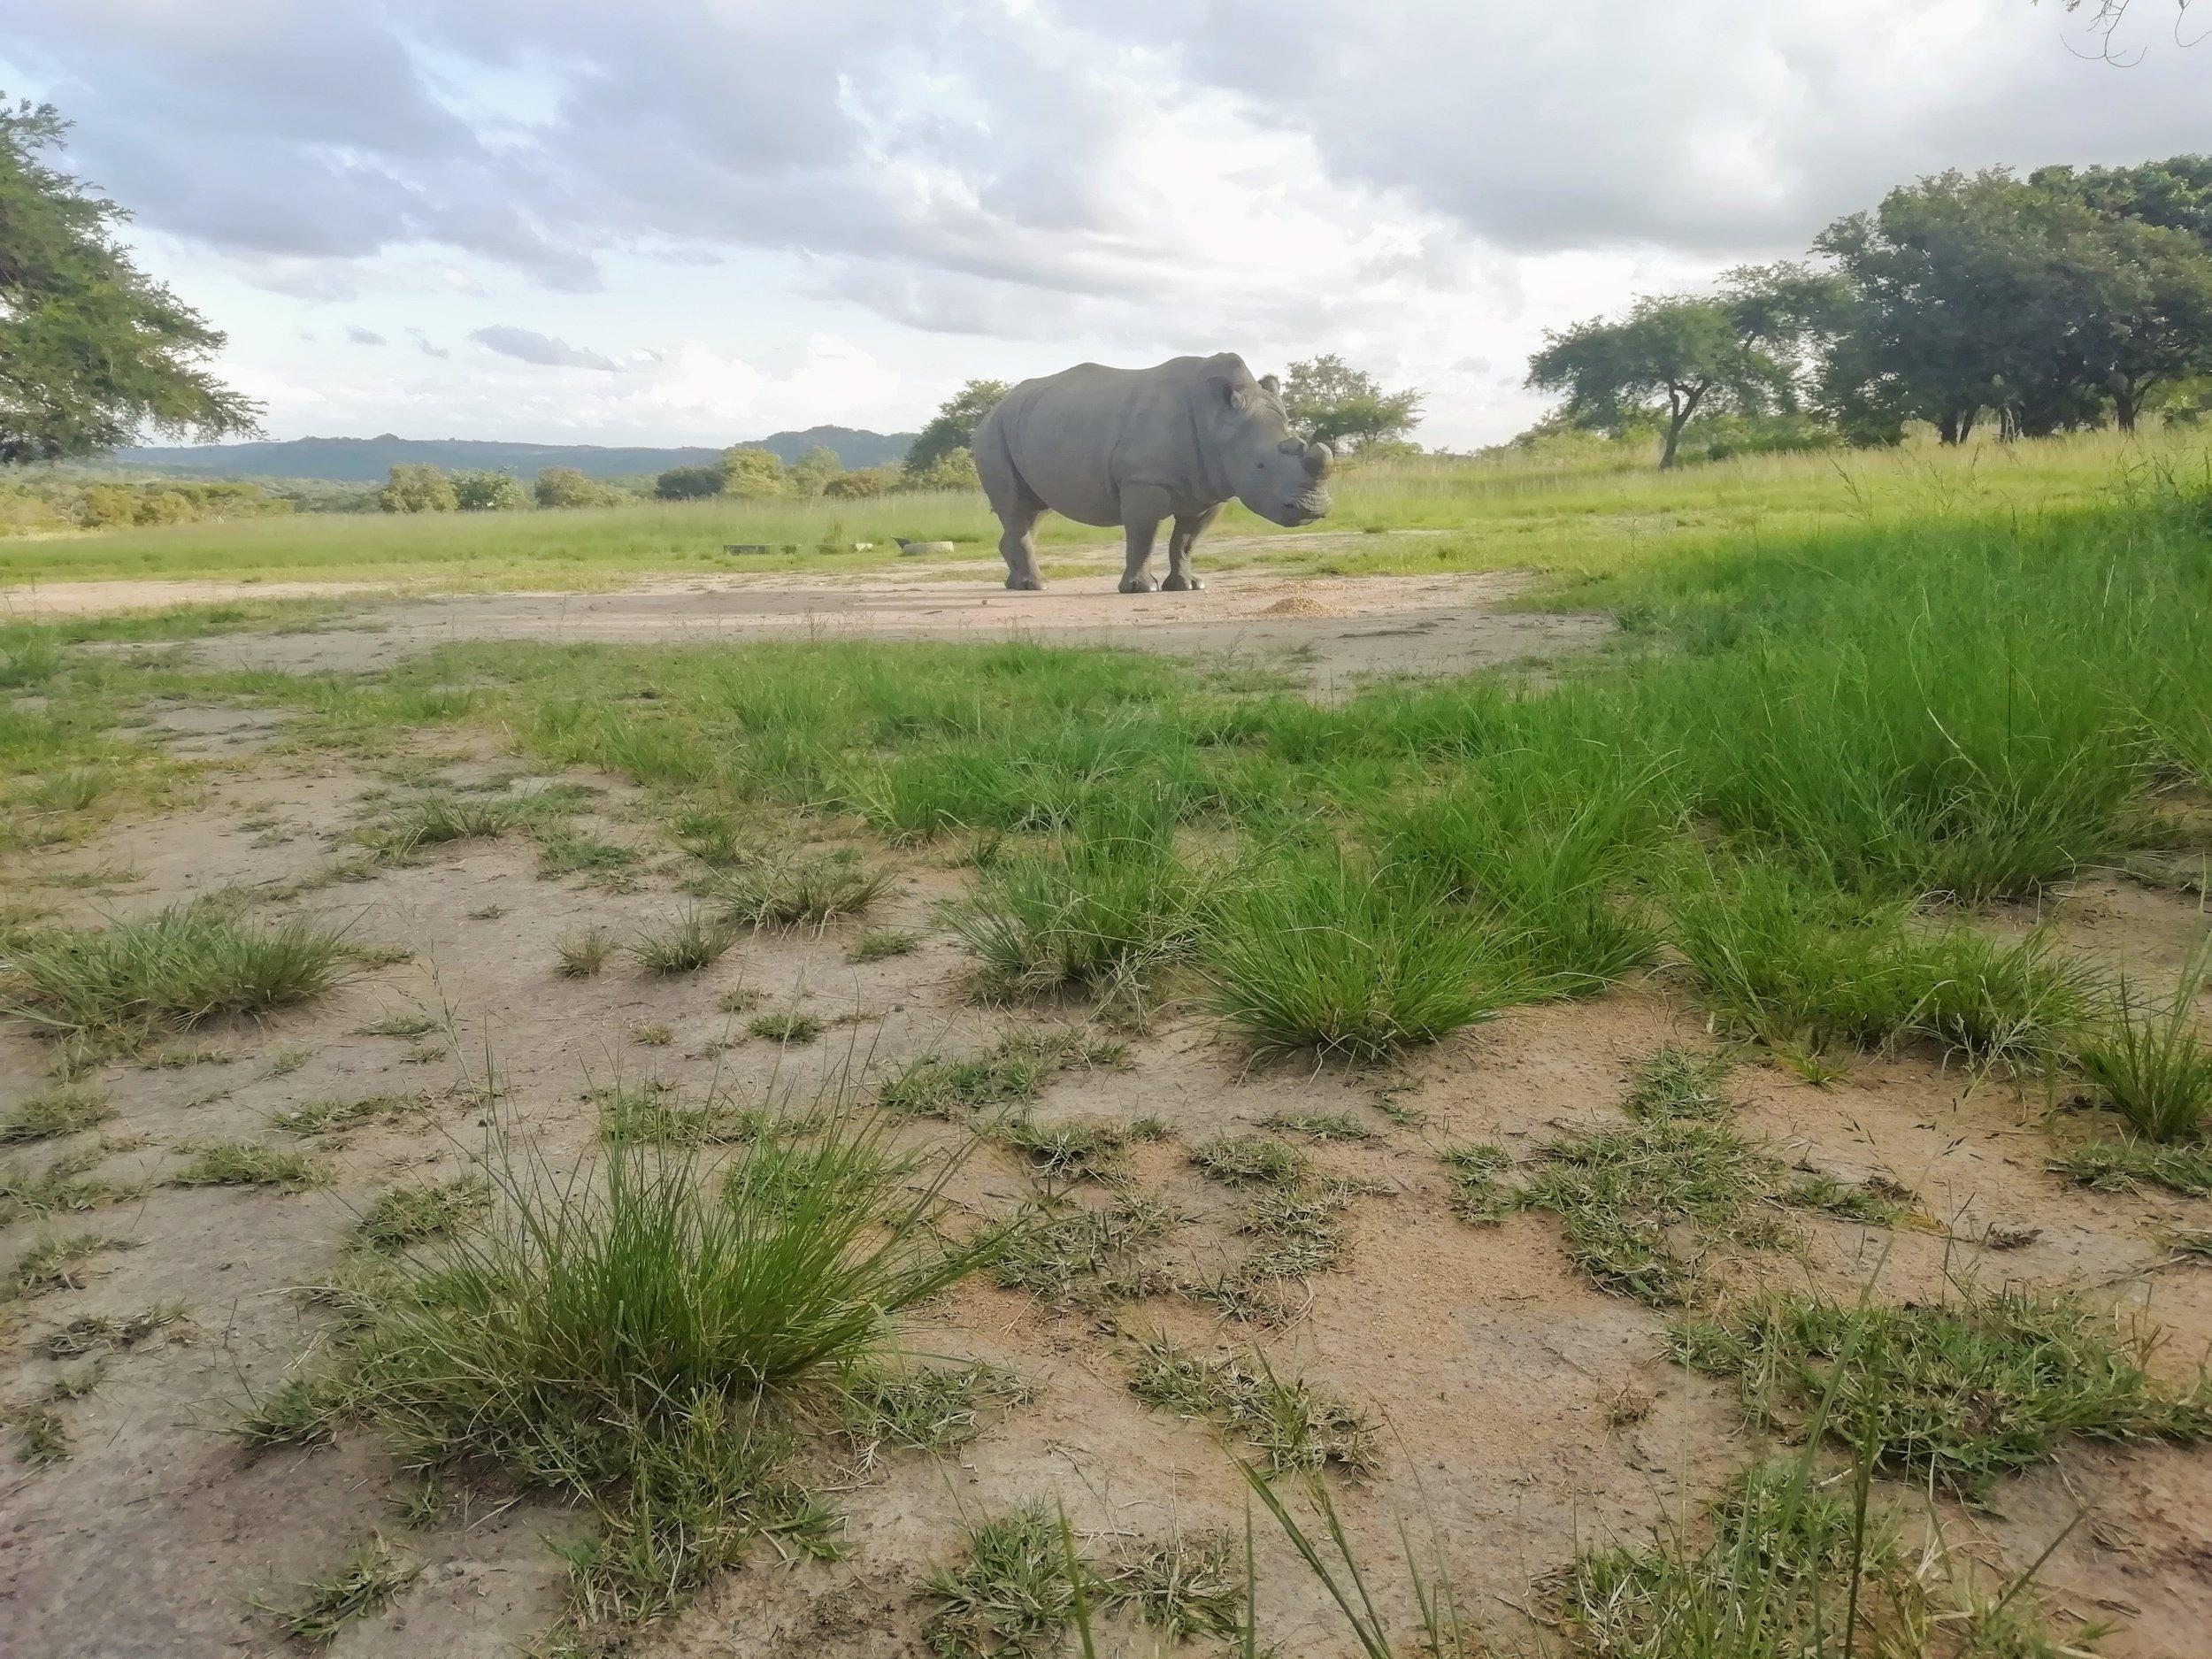 Rhino at Thetford Game Reserve